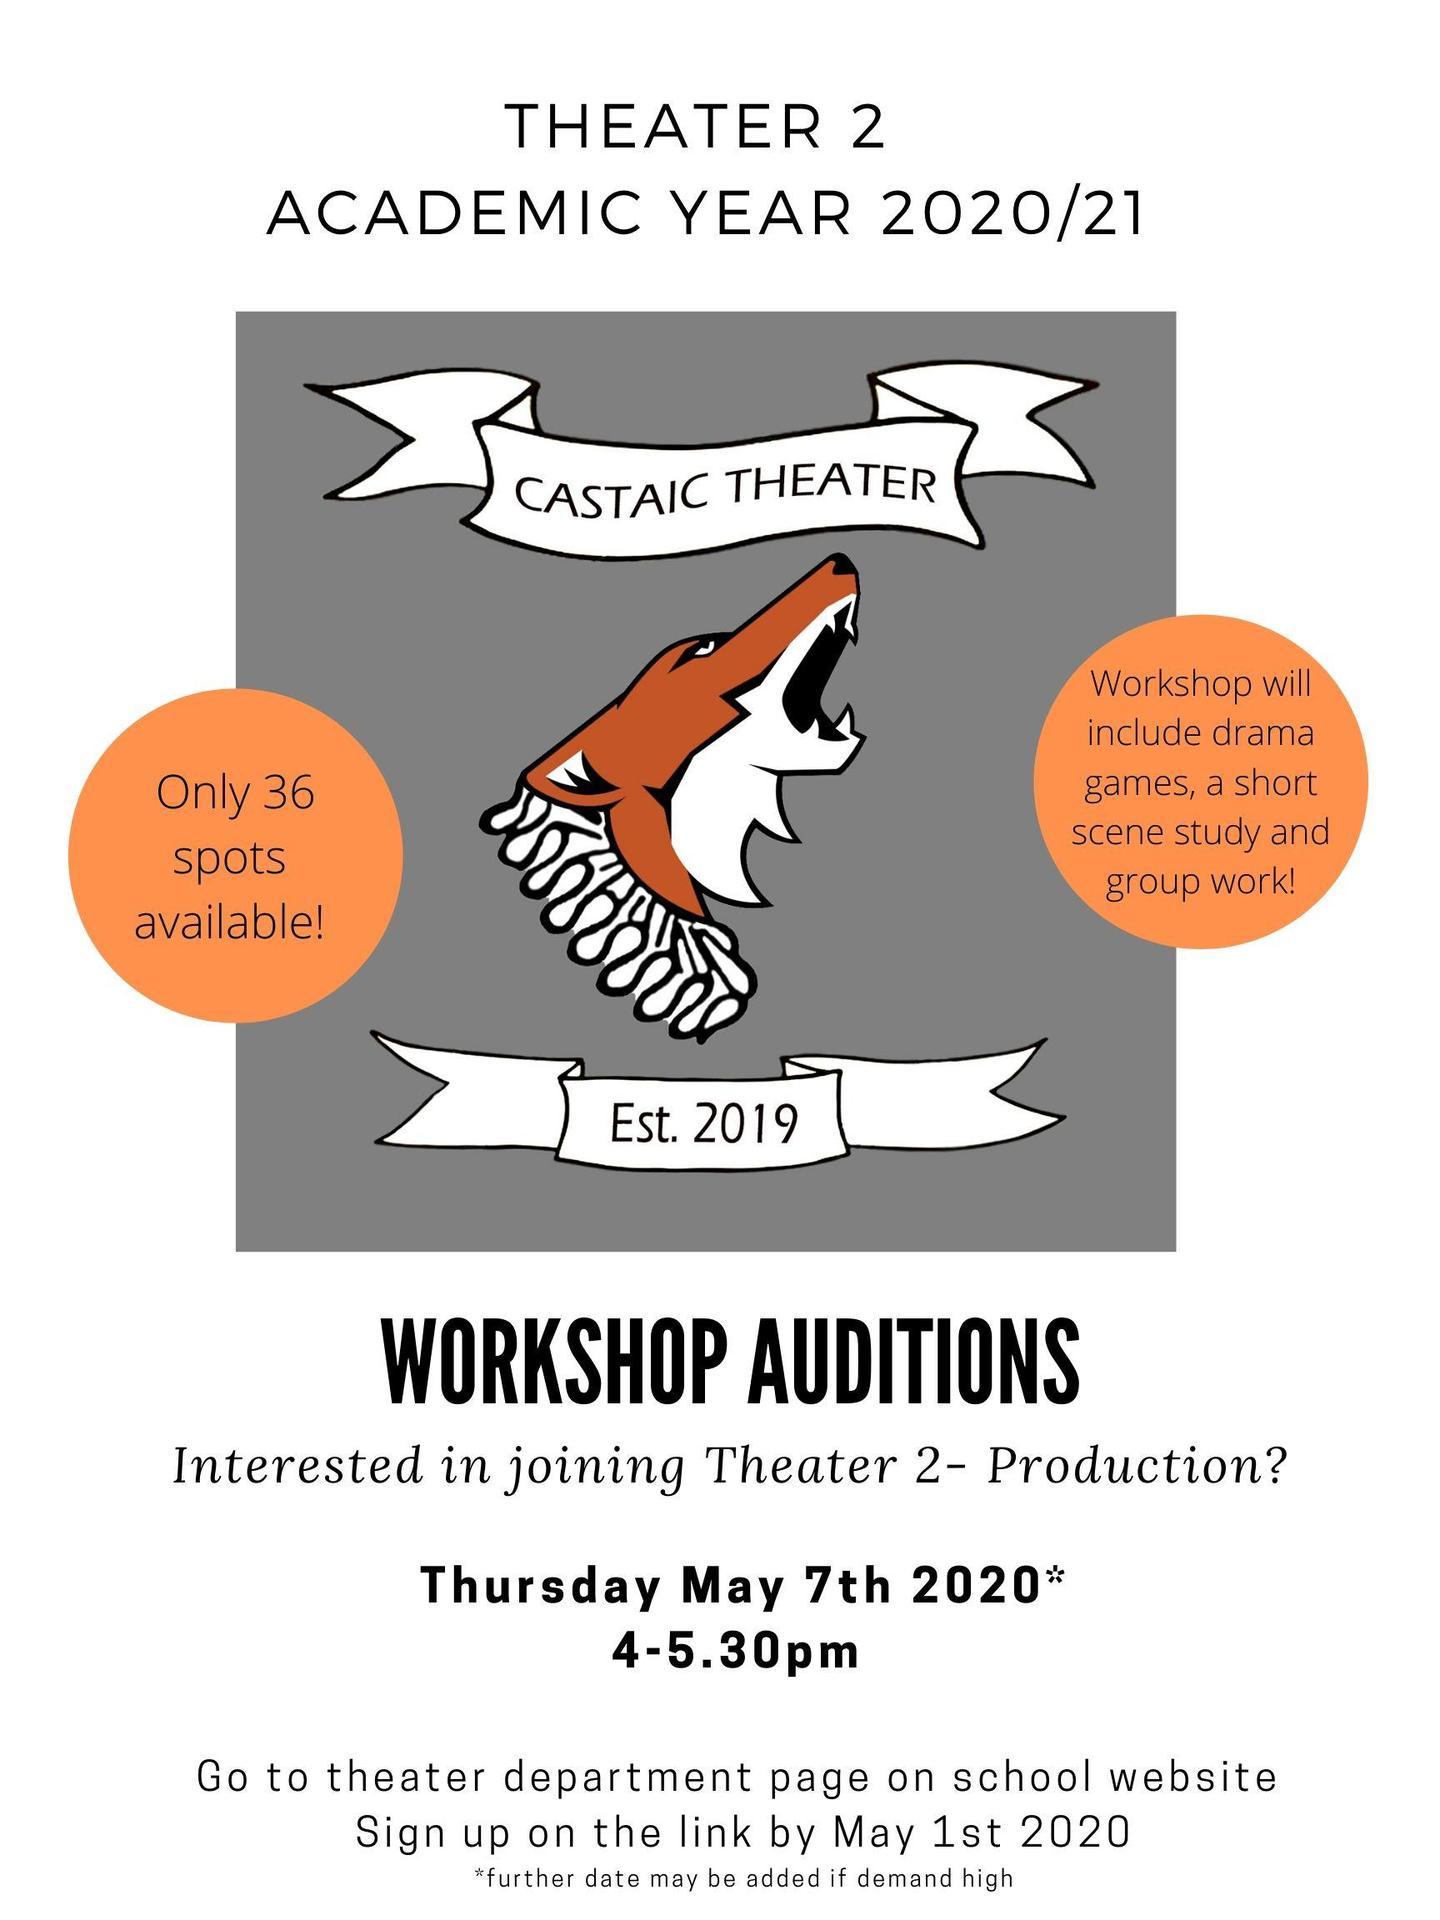 Theater 2 Workshop Audition Information!